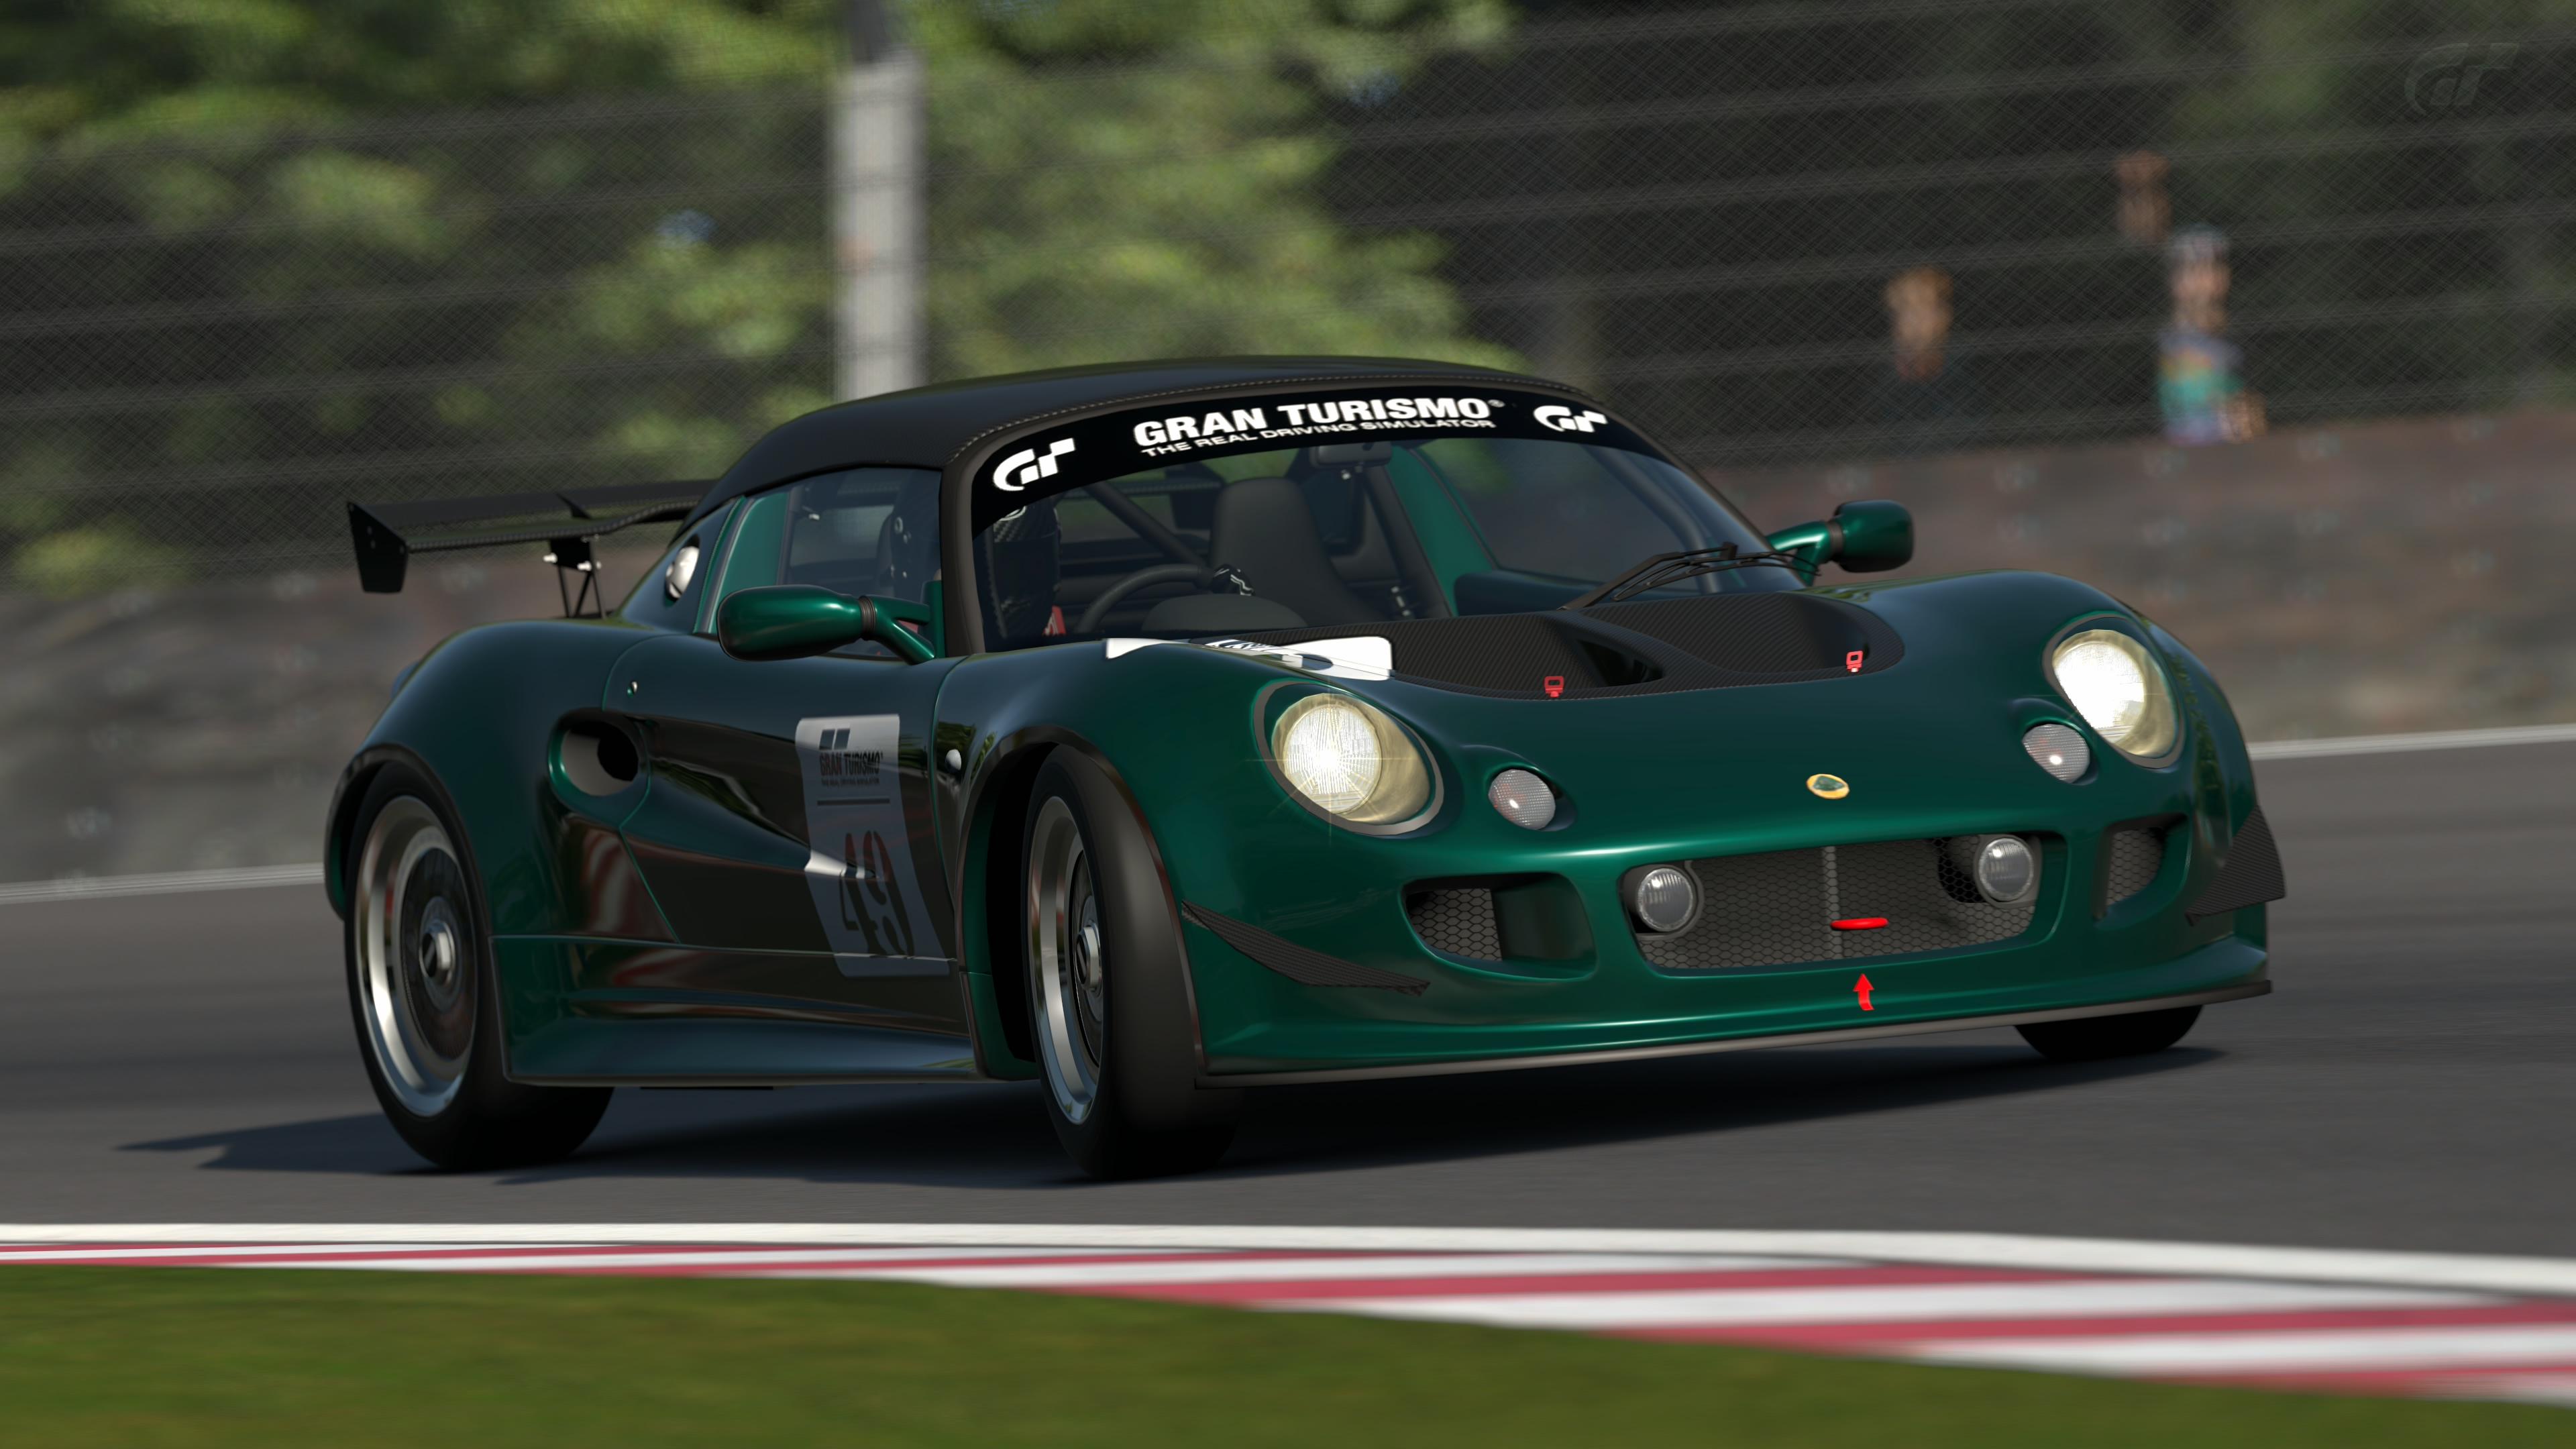 lotus_elise_race_car__gran_turismo_6__by_vertualissimo-d79sagt Remarkable Lotus Carlton Gran Turismo 5 Cars Trend